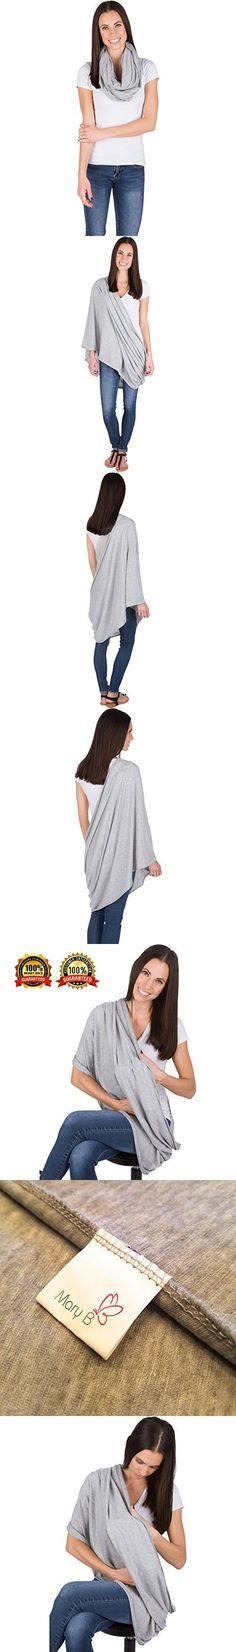 Breastfeeding Infinity Scarf & Nursing Cover by Mary B. Premium Soft Cotton, Grey.